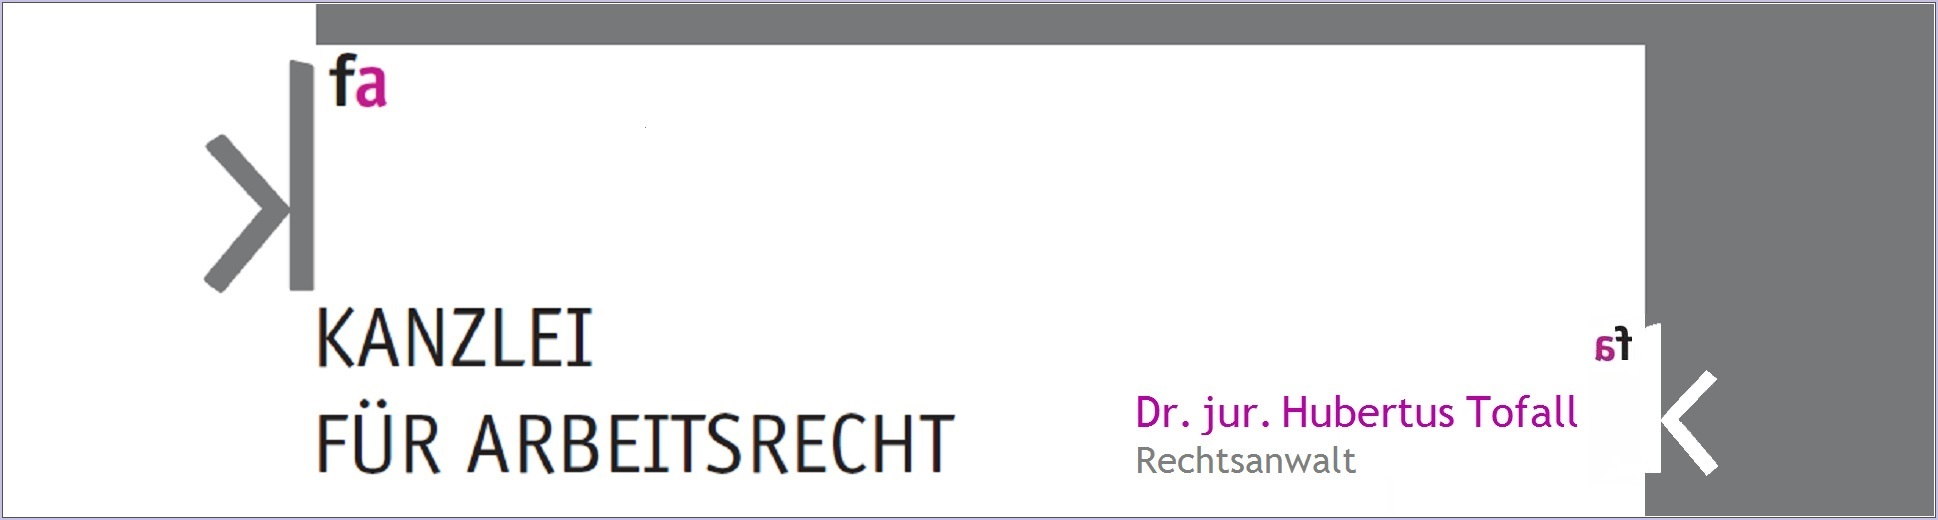 Kanzlei für Arbeitsrecht – Dr. Hubertus Tofall